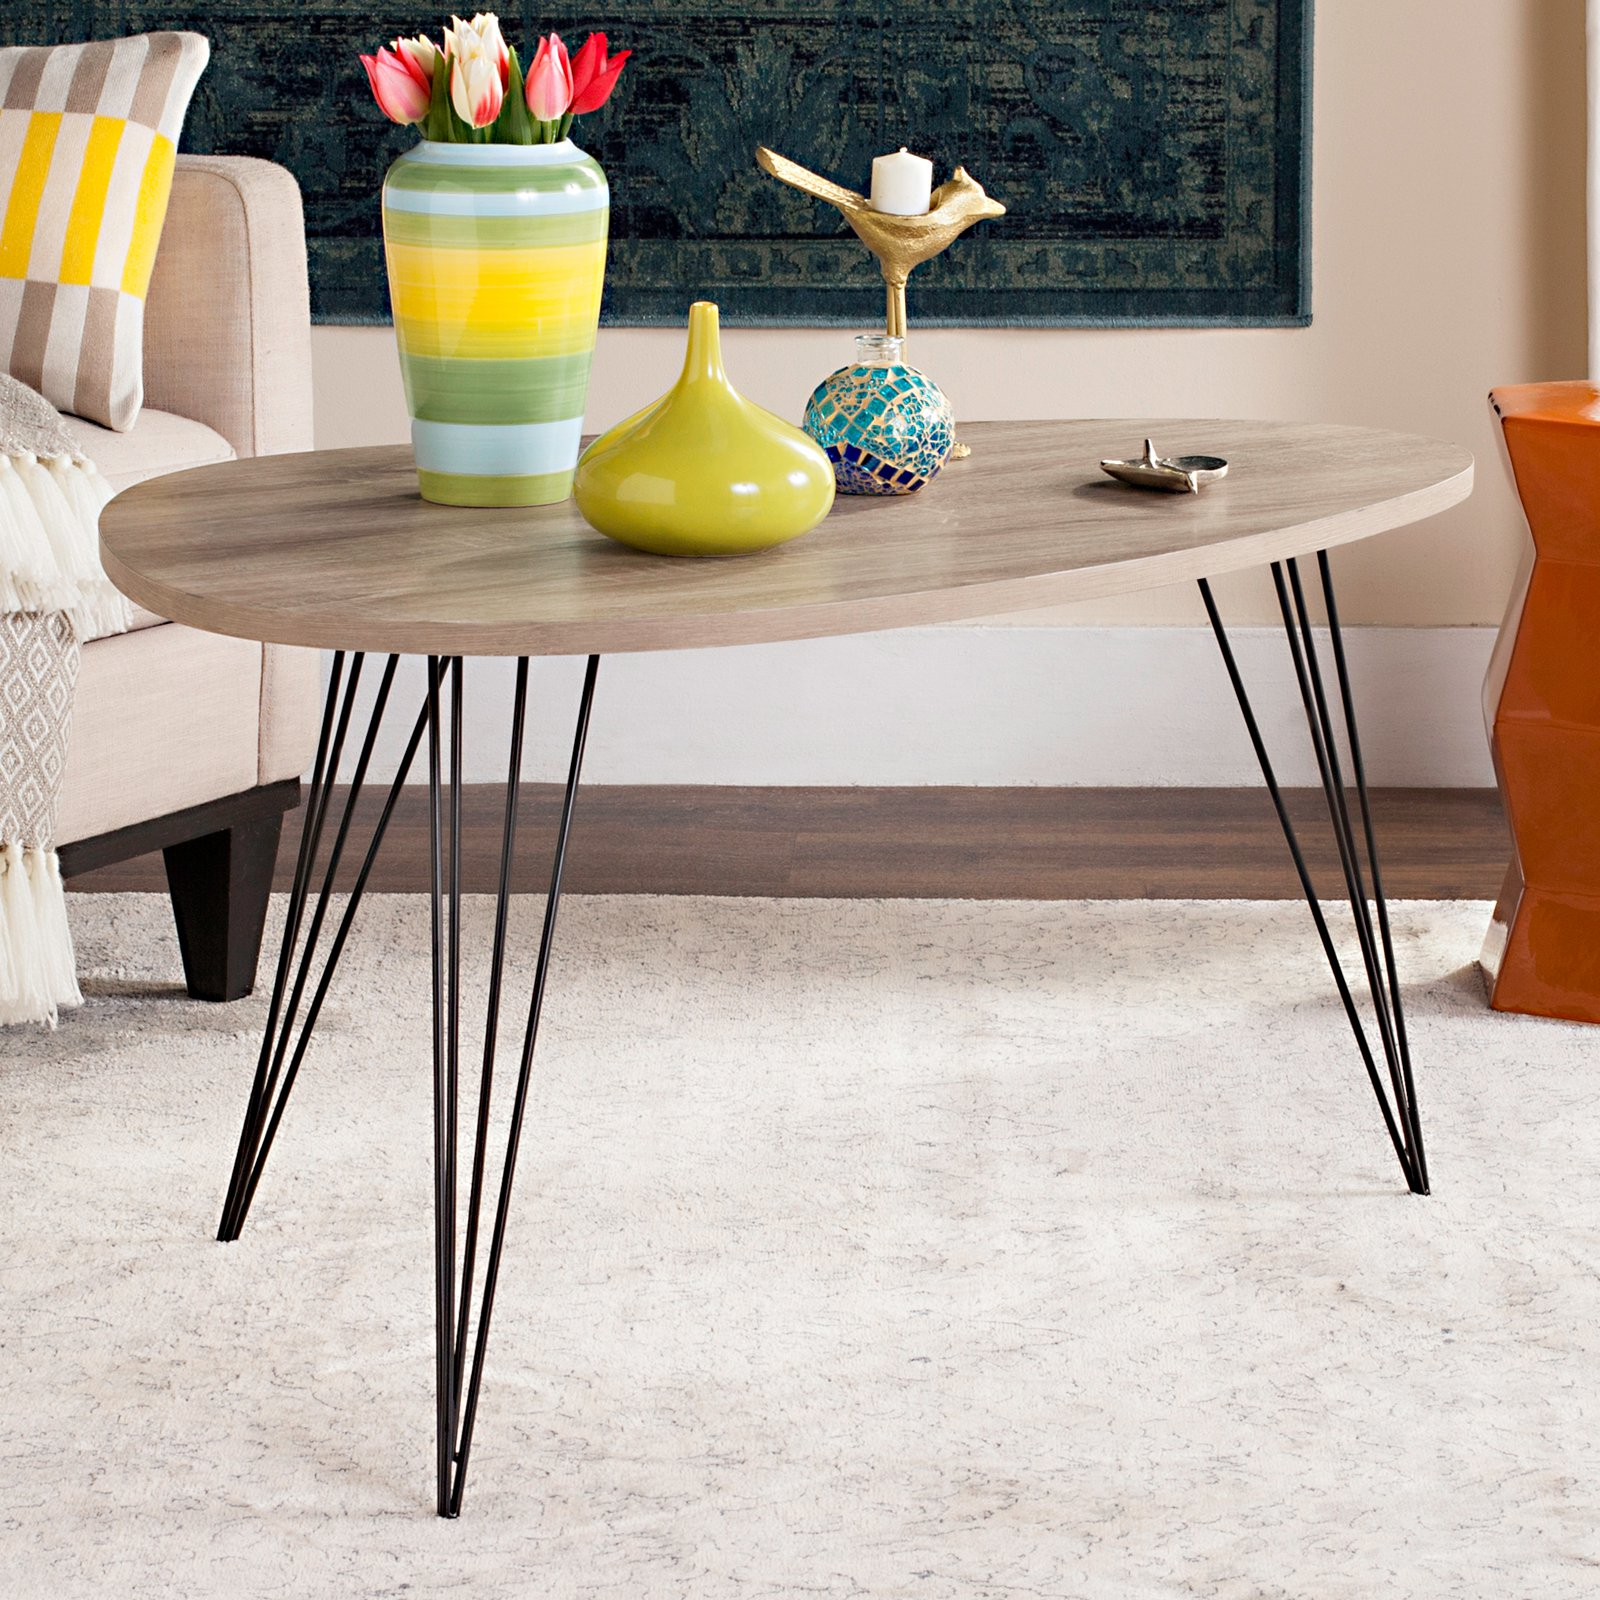 Safavieh Rocco Retro Mid Century Coffee Table, Multiple Colors